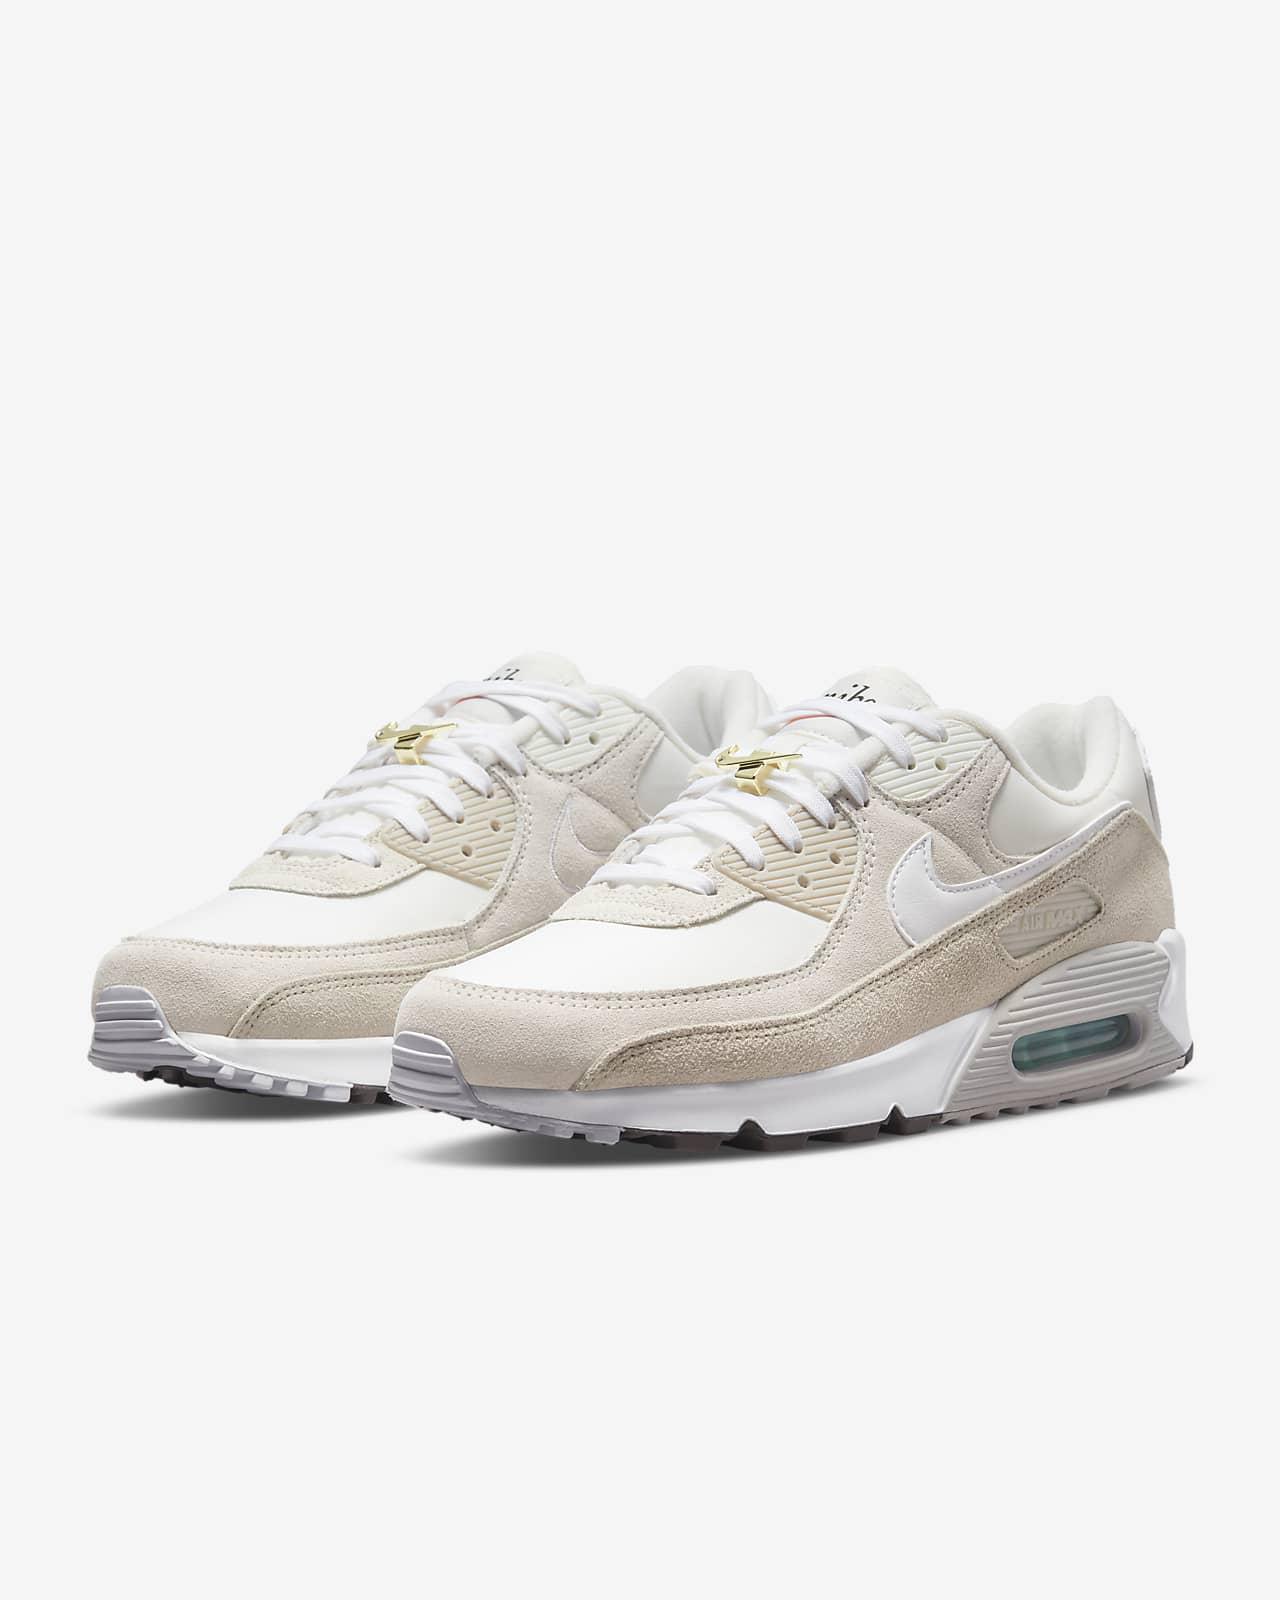 Nike Air Max 90 SE Men's Shoes. Nike LU